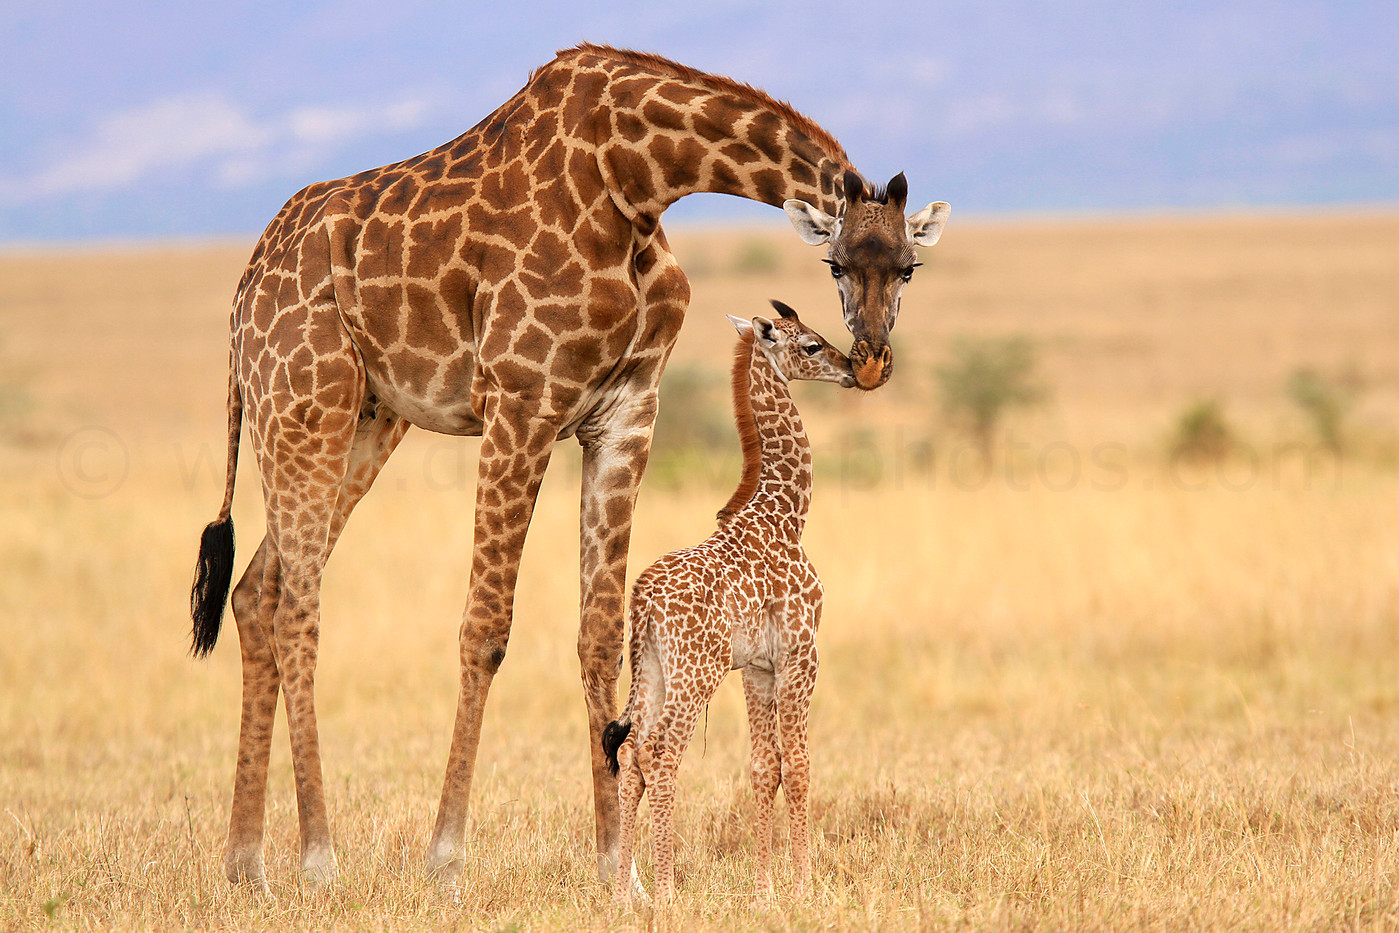 Masai Giraffe & newborn calf in the Grumeti Reserve, Tanzania